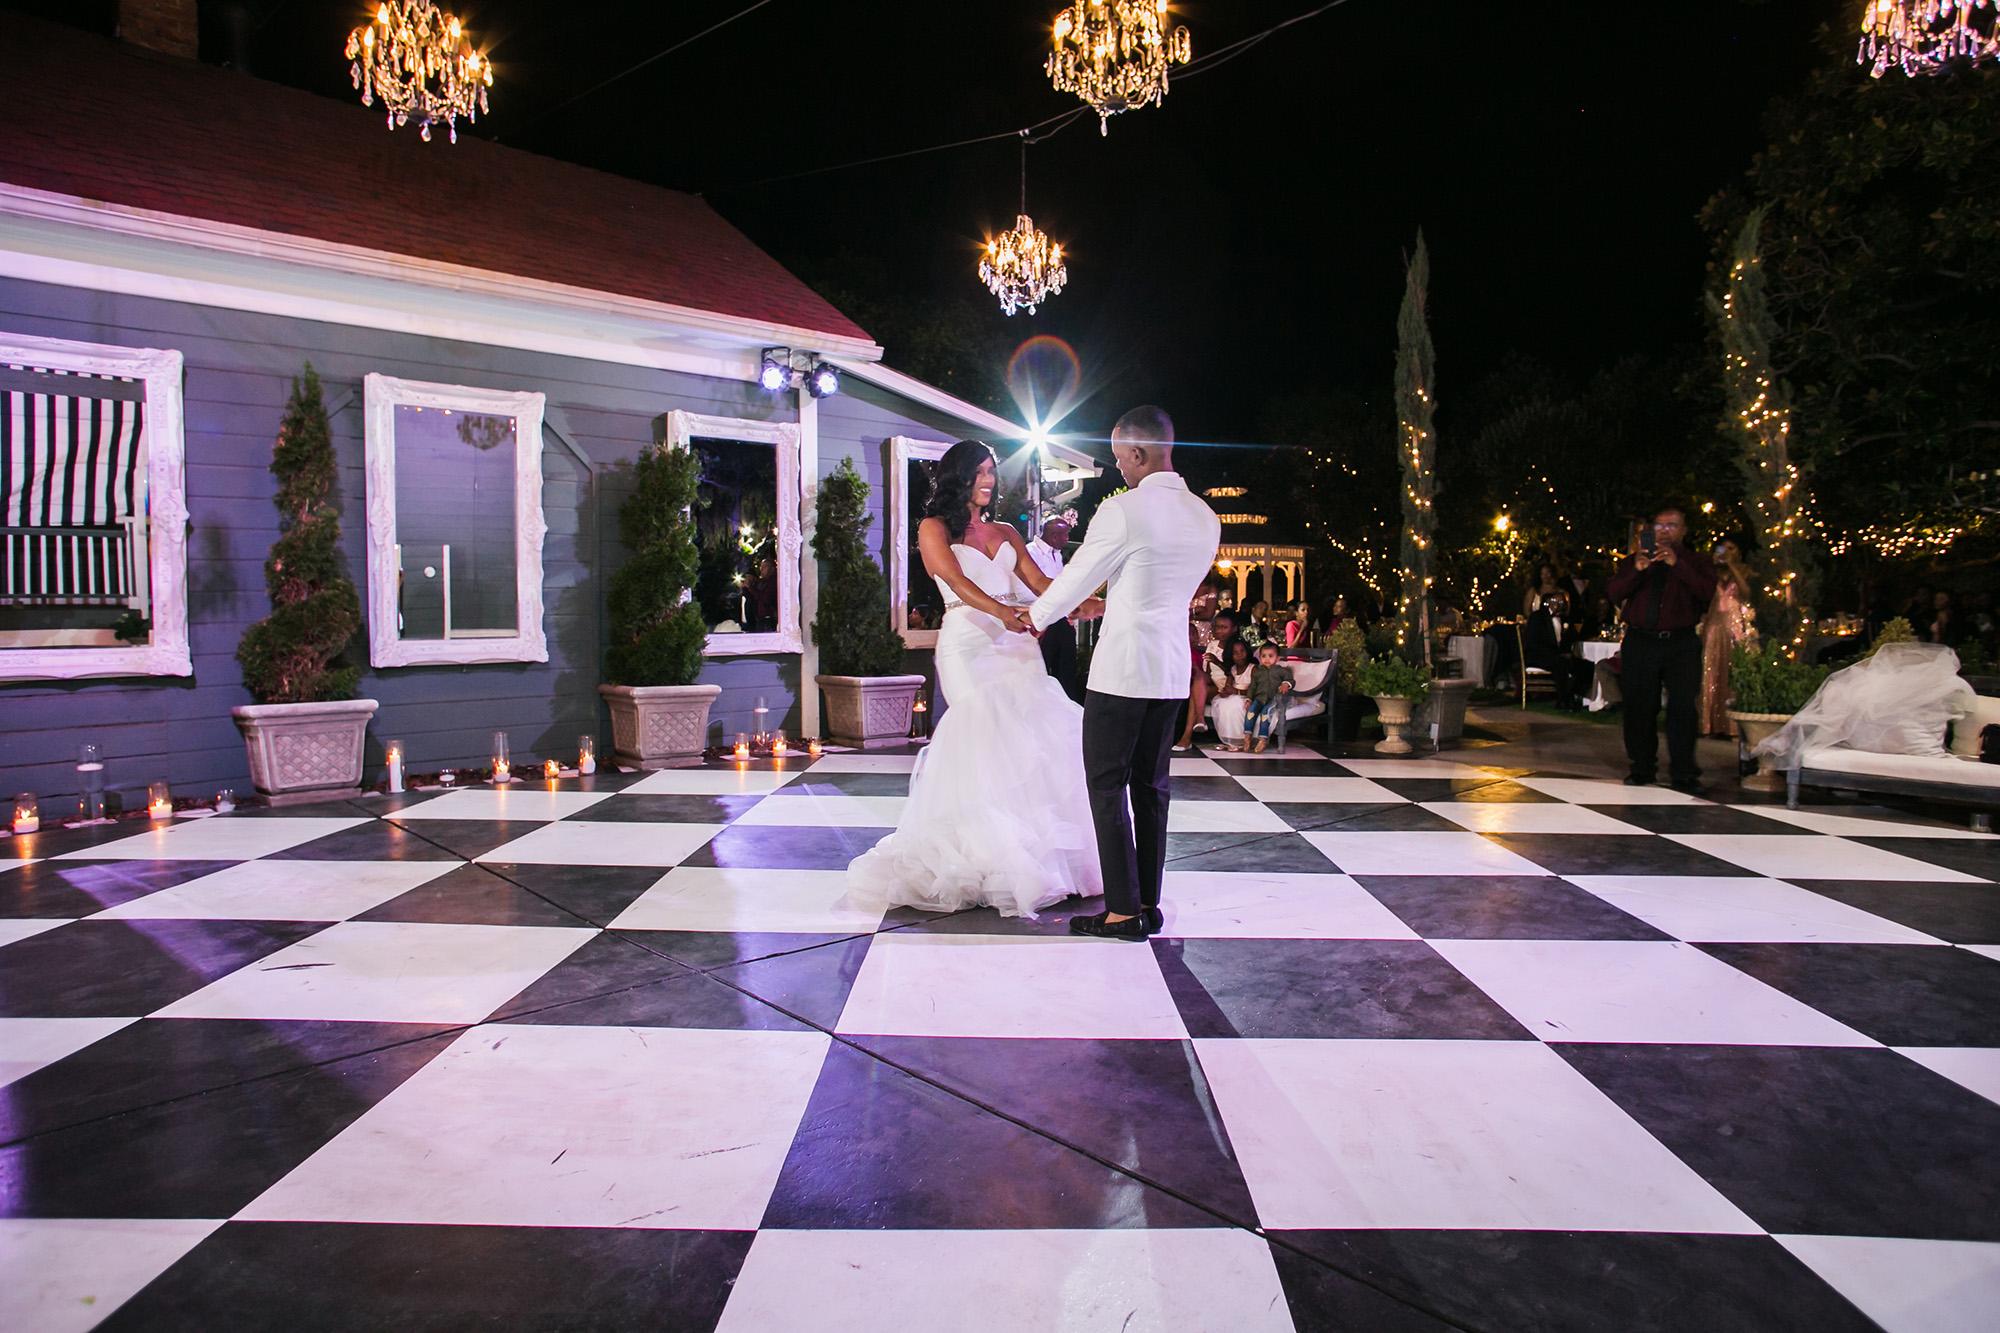 associate-photographer-christmas-house-wedding-carrie-vines-0081.jpg